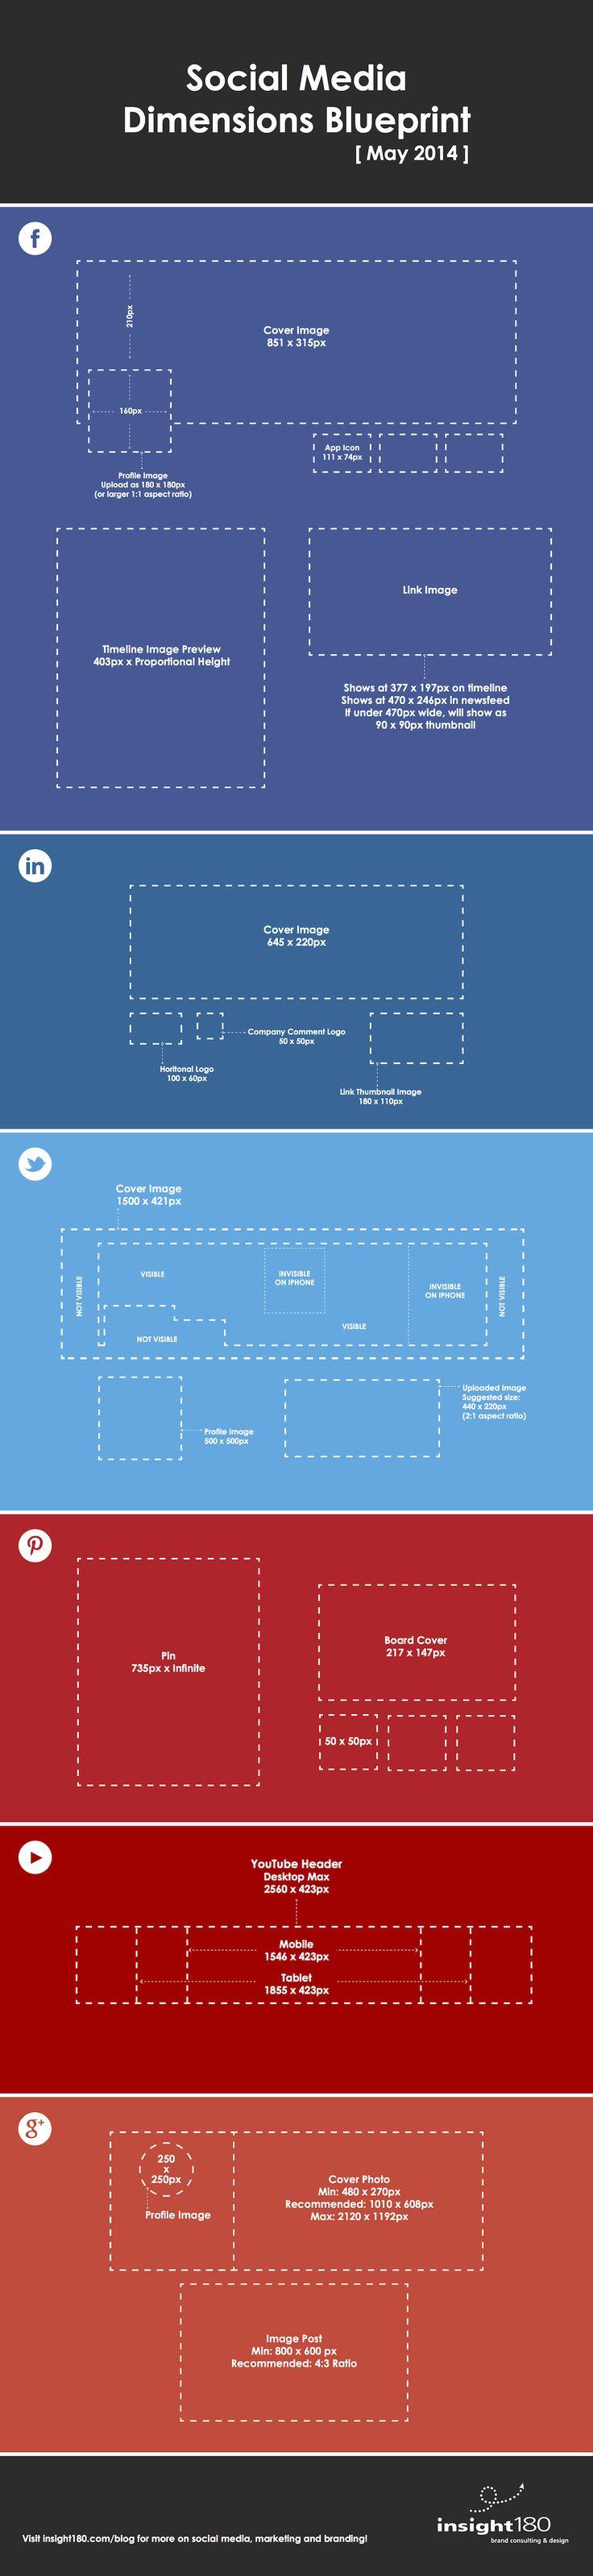 Facebook, LinkedIn, Twitter, Pinterest - Social Media #Dimensions #Guide [INFOGRAPHIC]